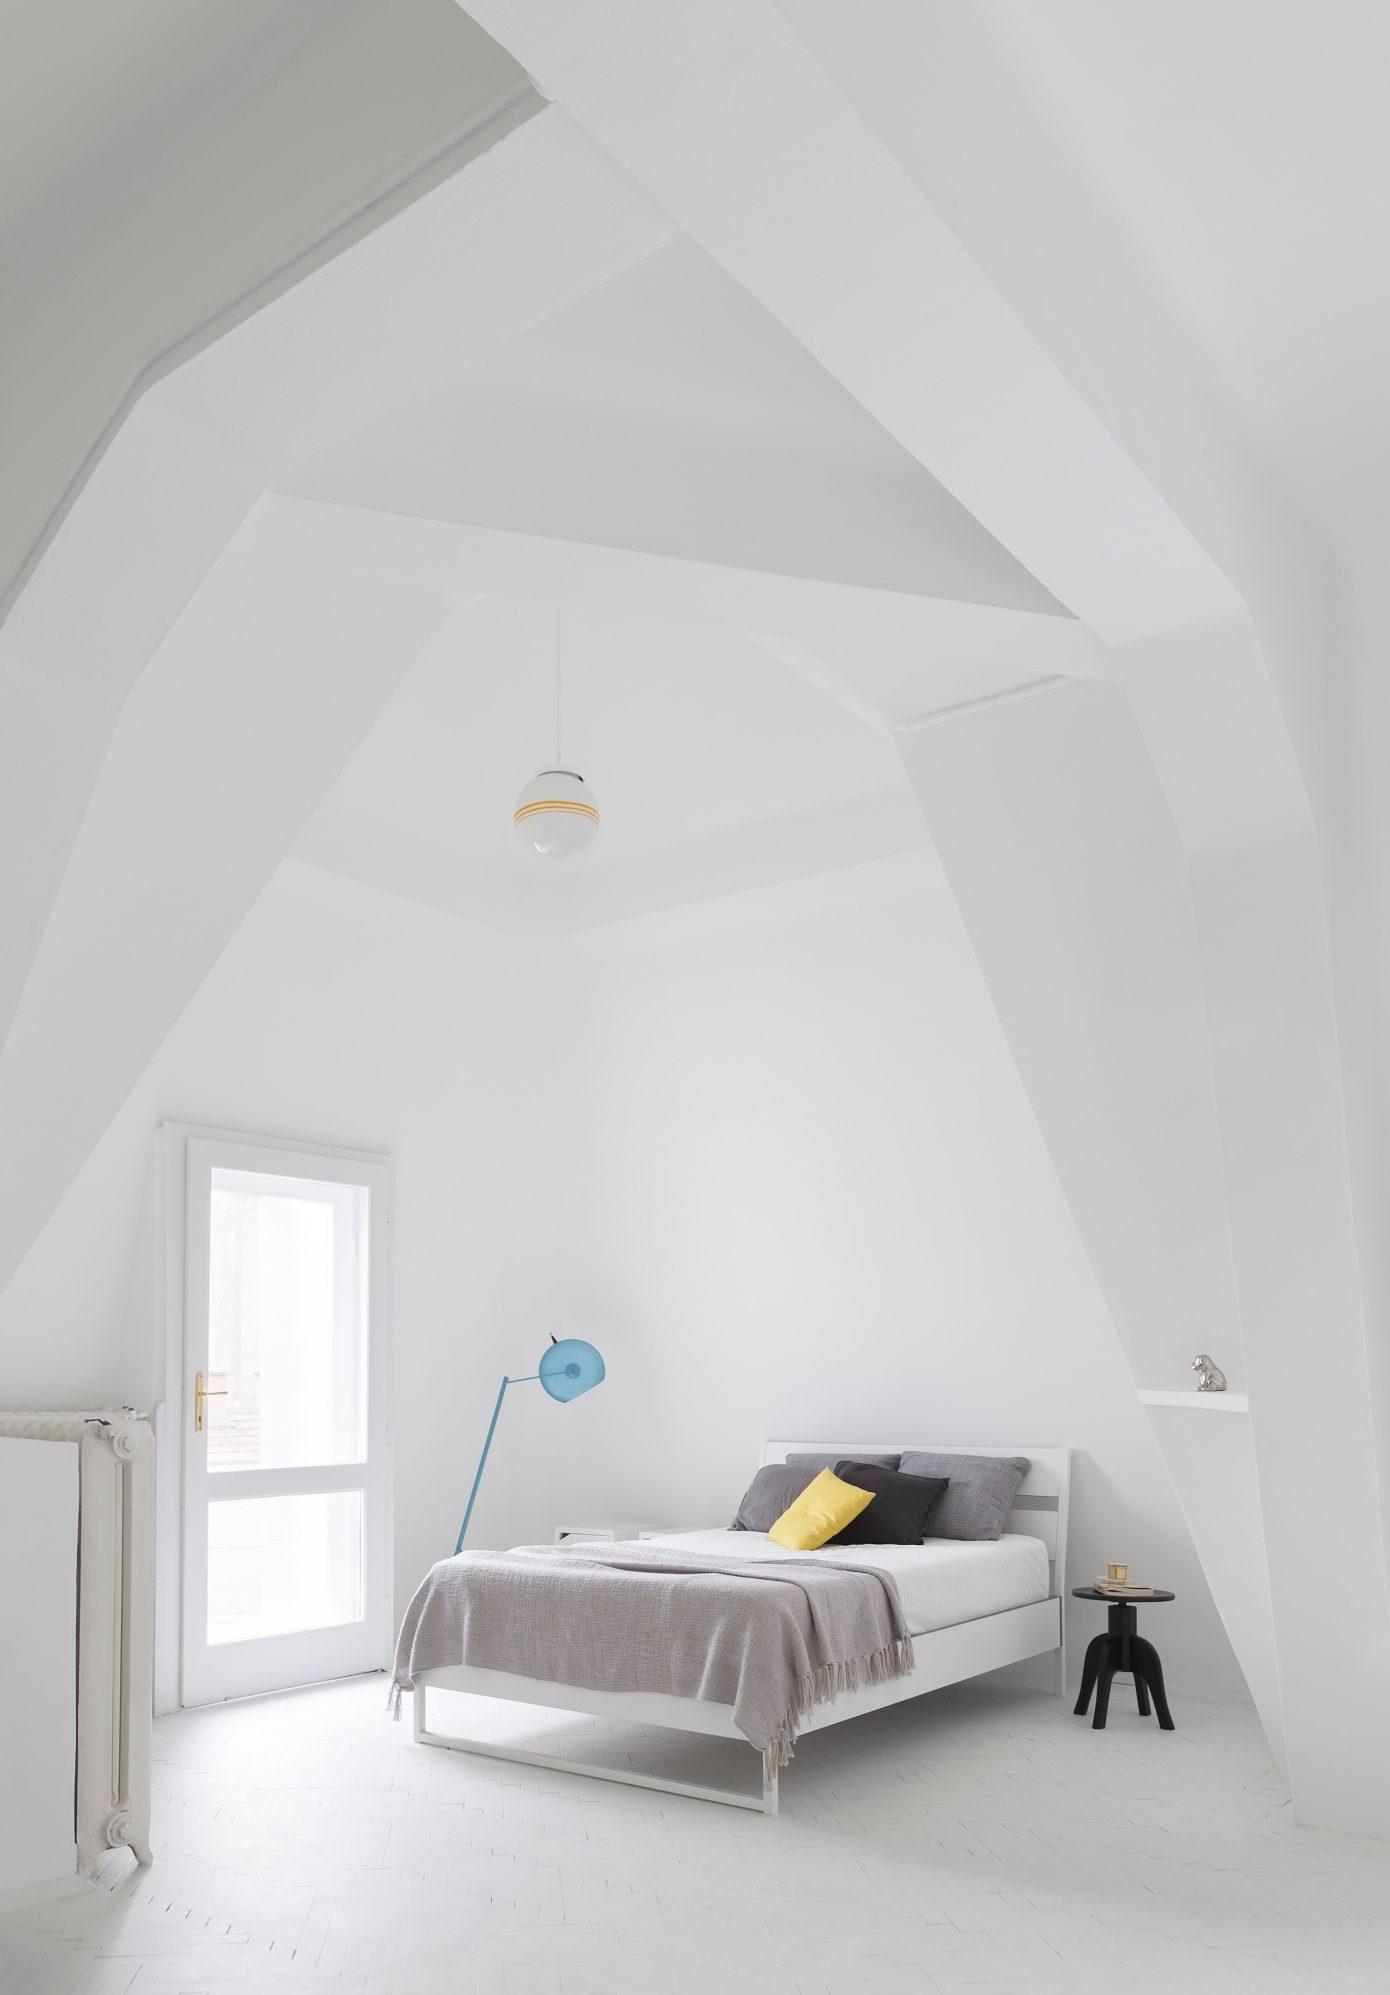 Zoltan Apartment by A+Z Design Studio